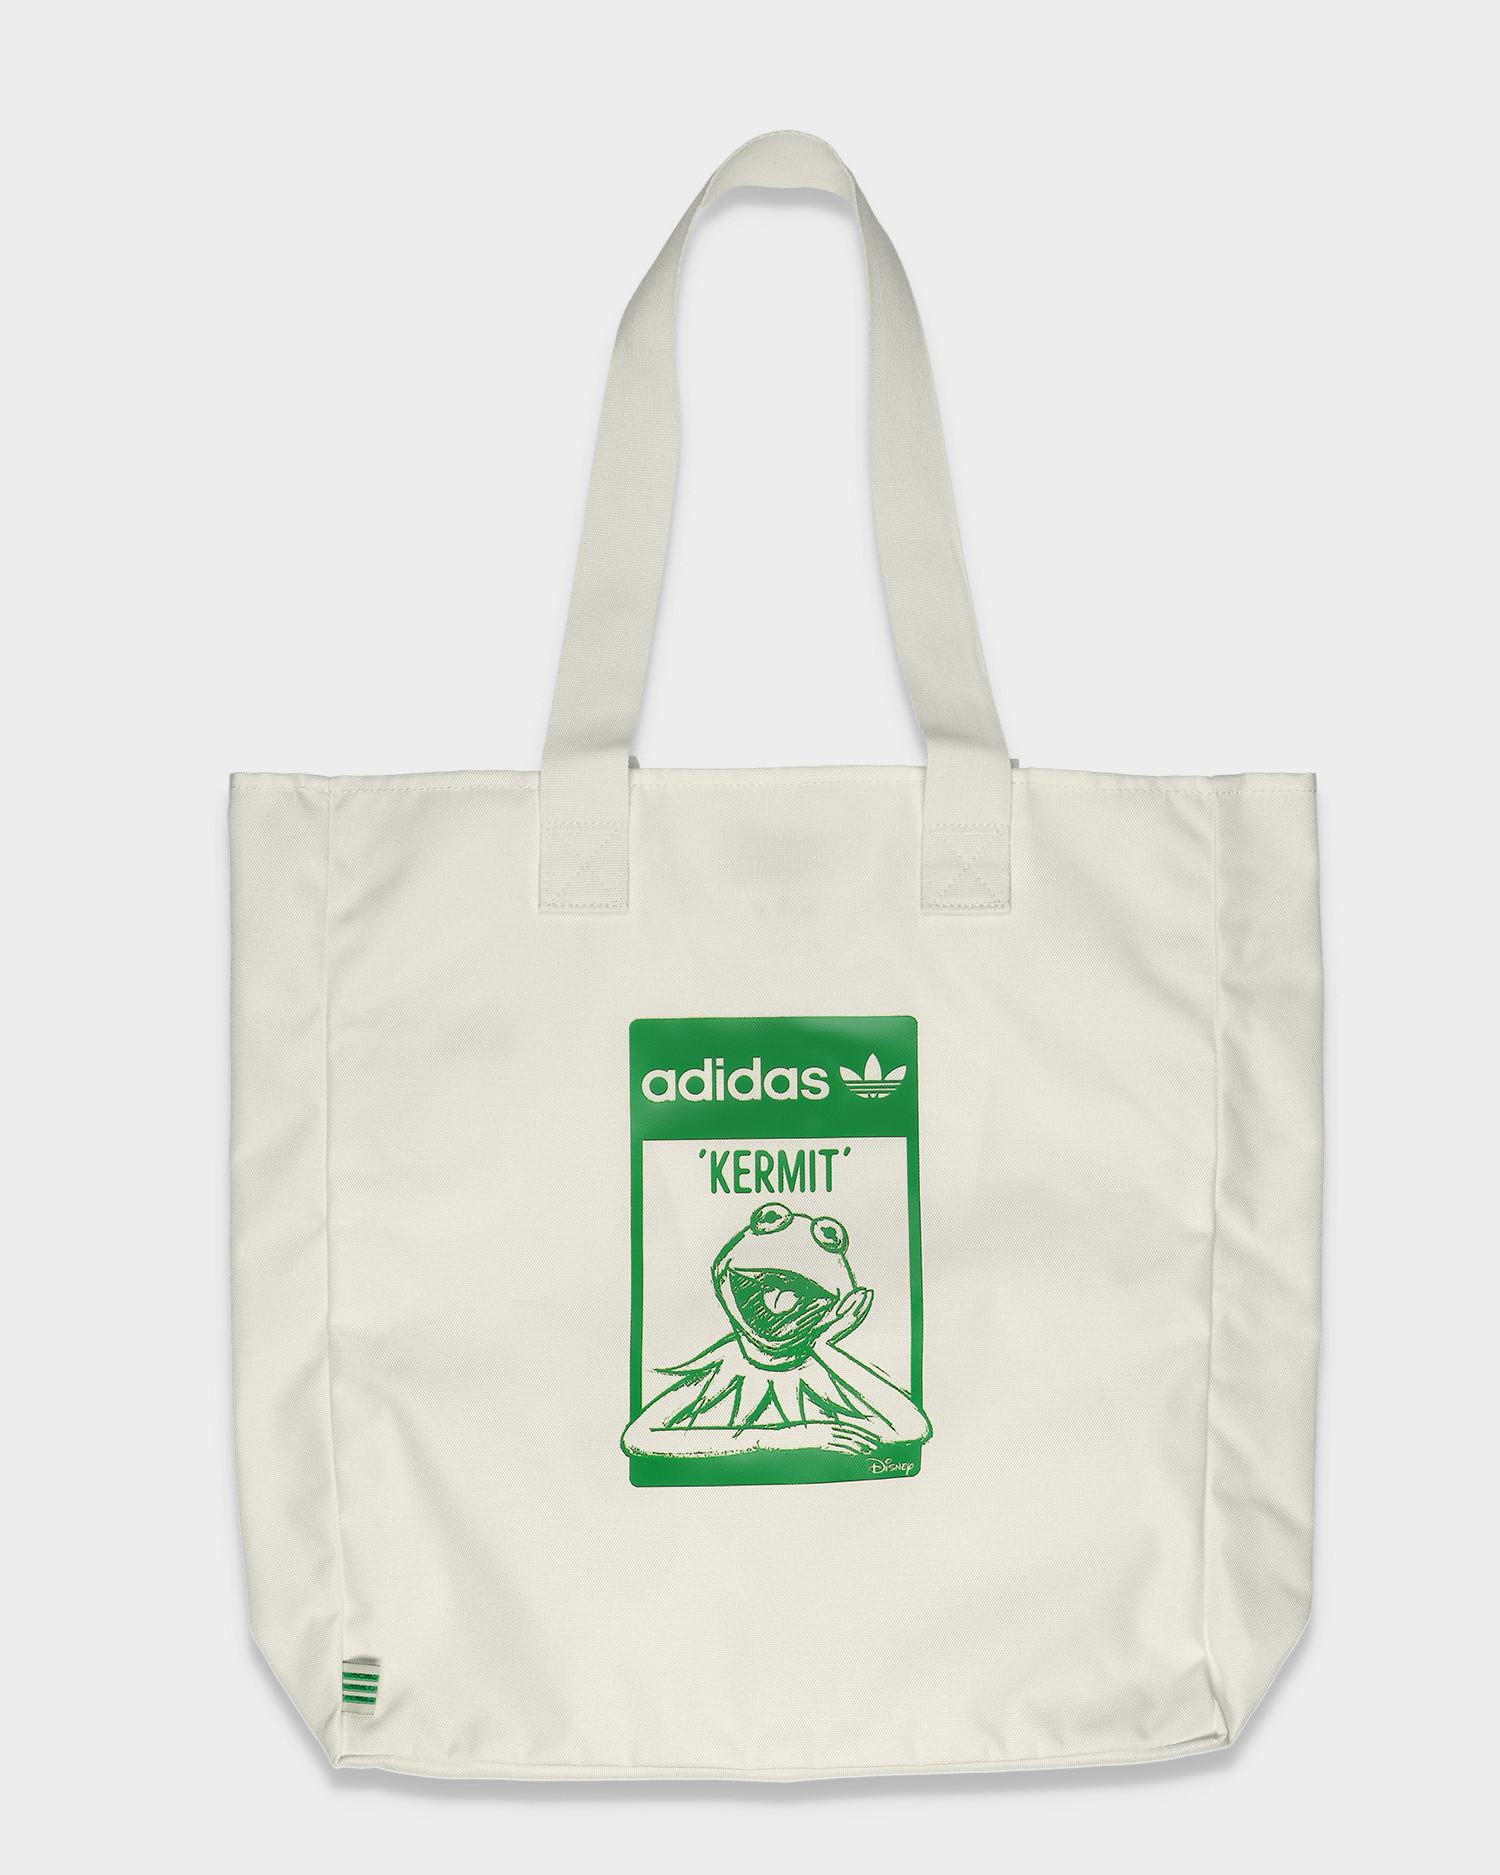 Adidas Kermit Shopper Cwhite/Green